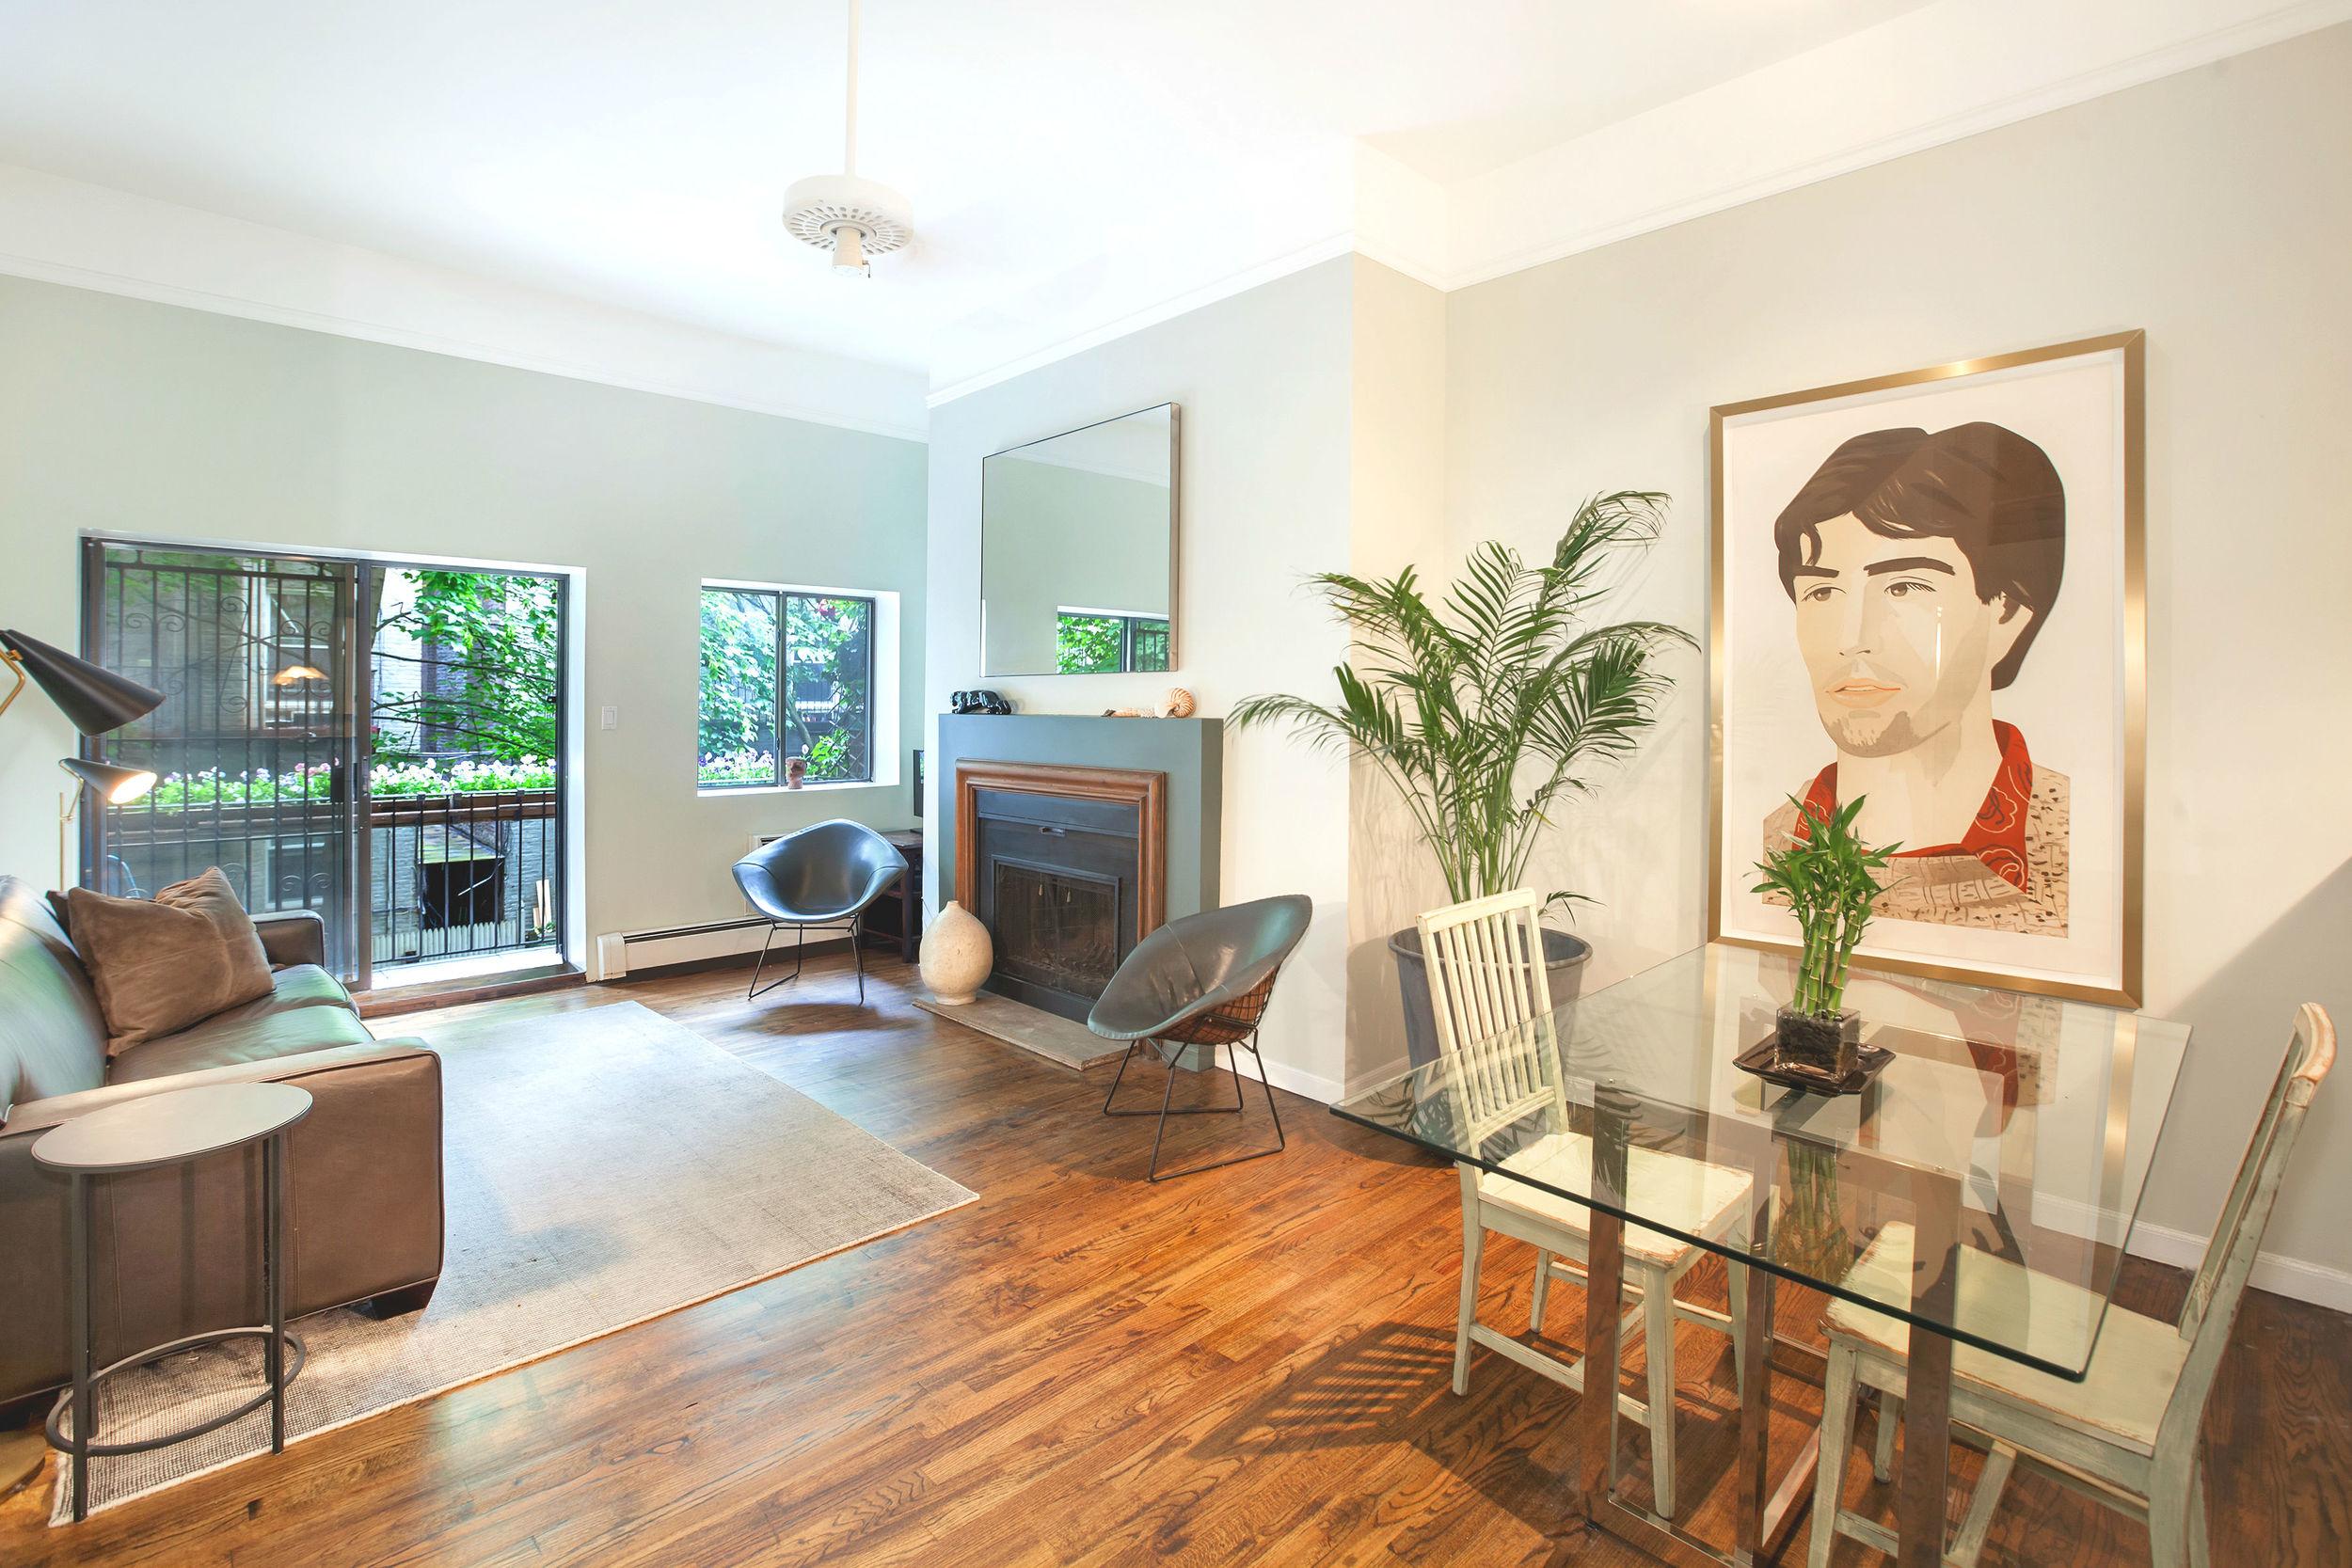 322 West 22nd Street, #4 - $1,150,000